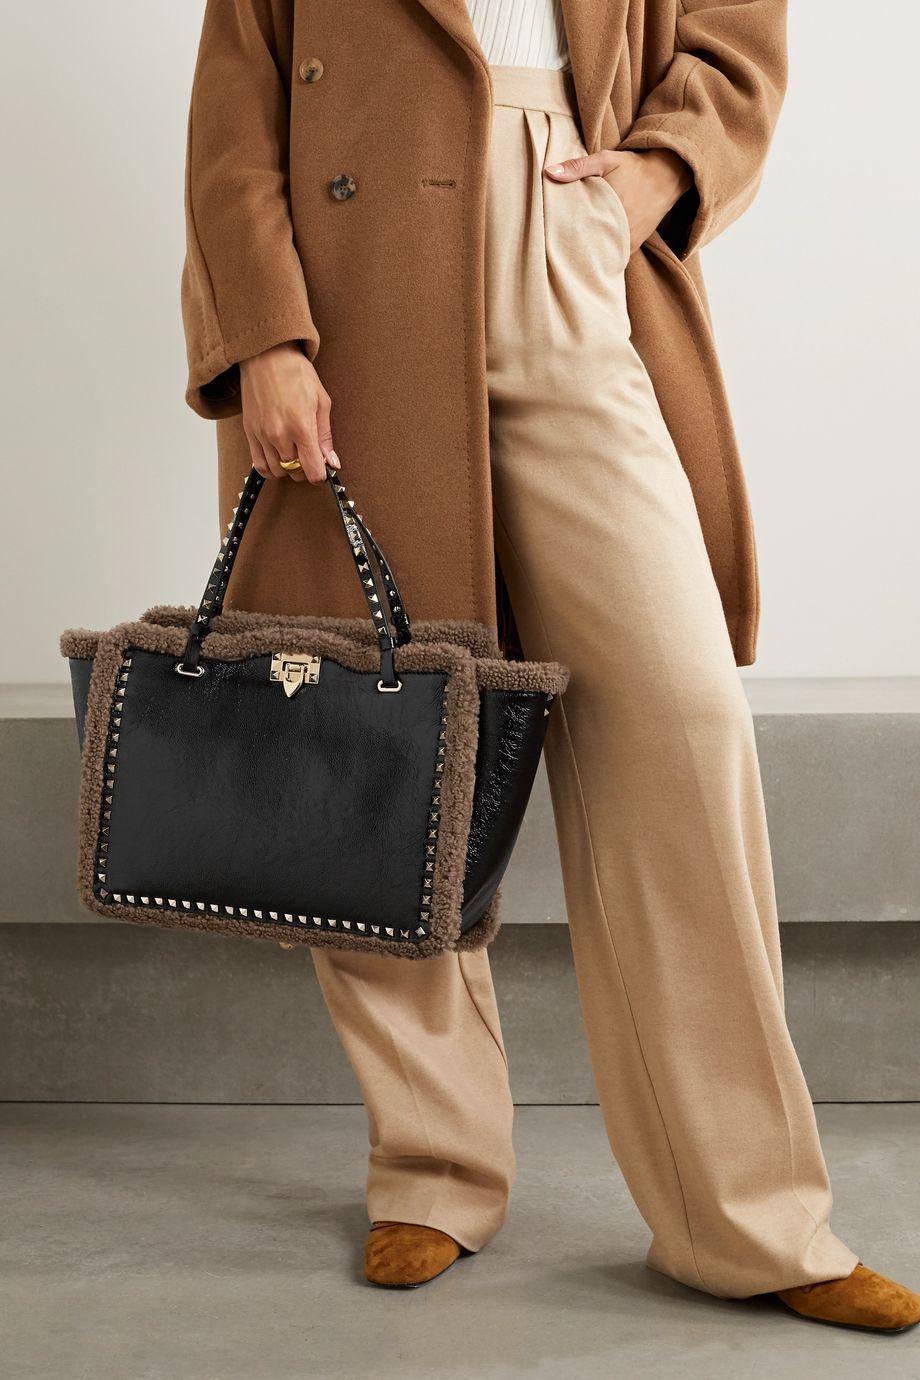 Valentino Valentino Garavani Rockstud shearling-trimmed crinkled-leather tote